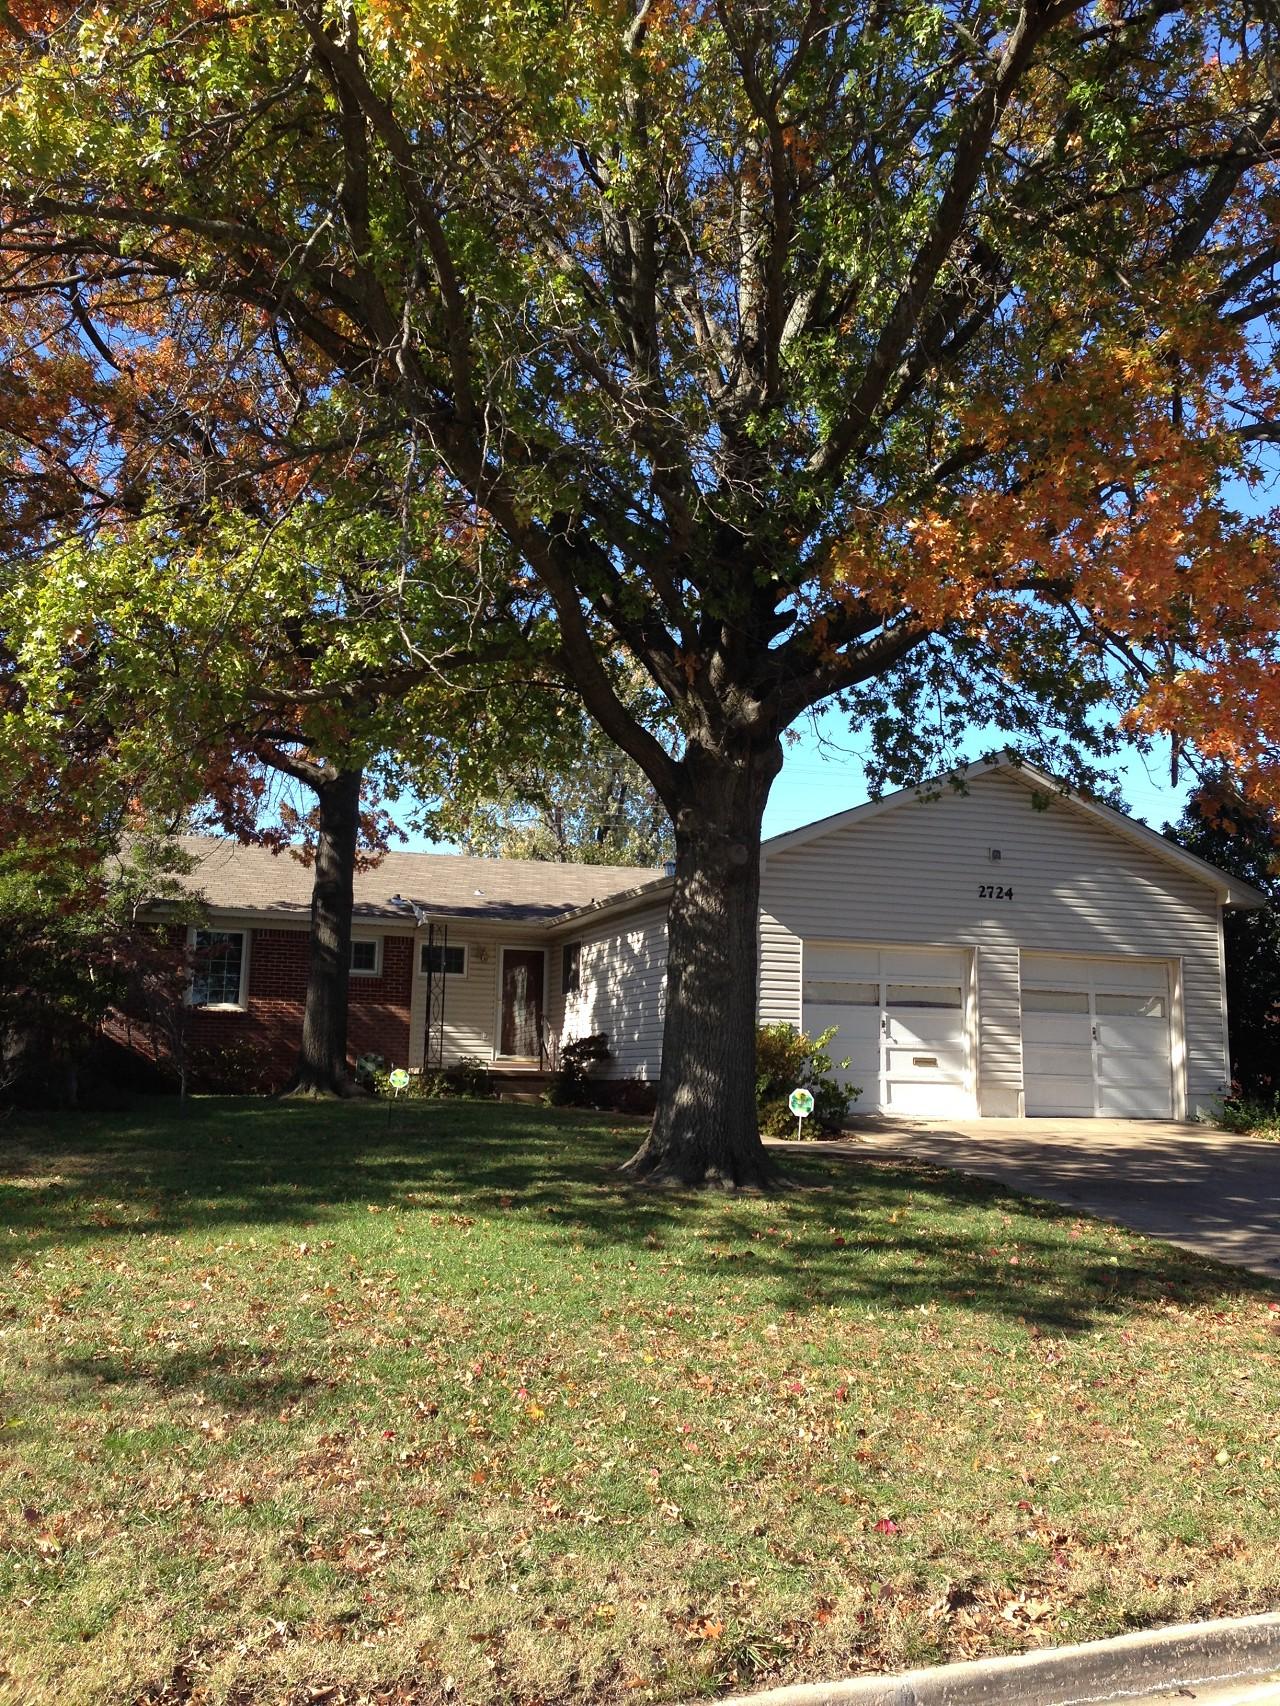 Single Family Home for Sale, ListingId:30679419, location: 2724 S Joplin Avenue Tulsa 74114